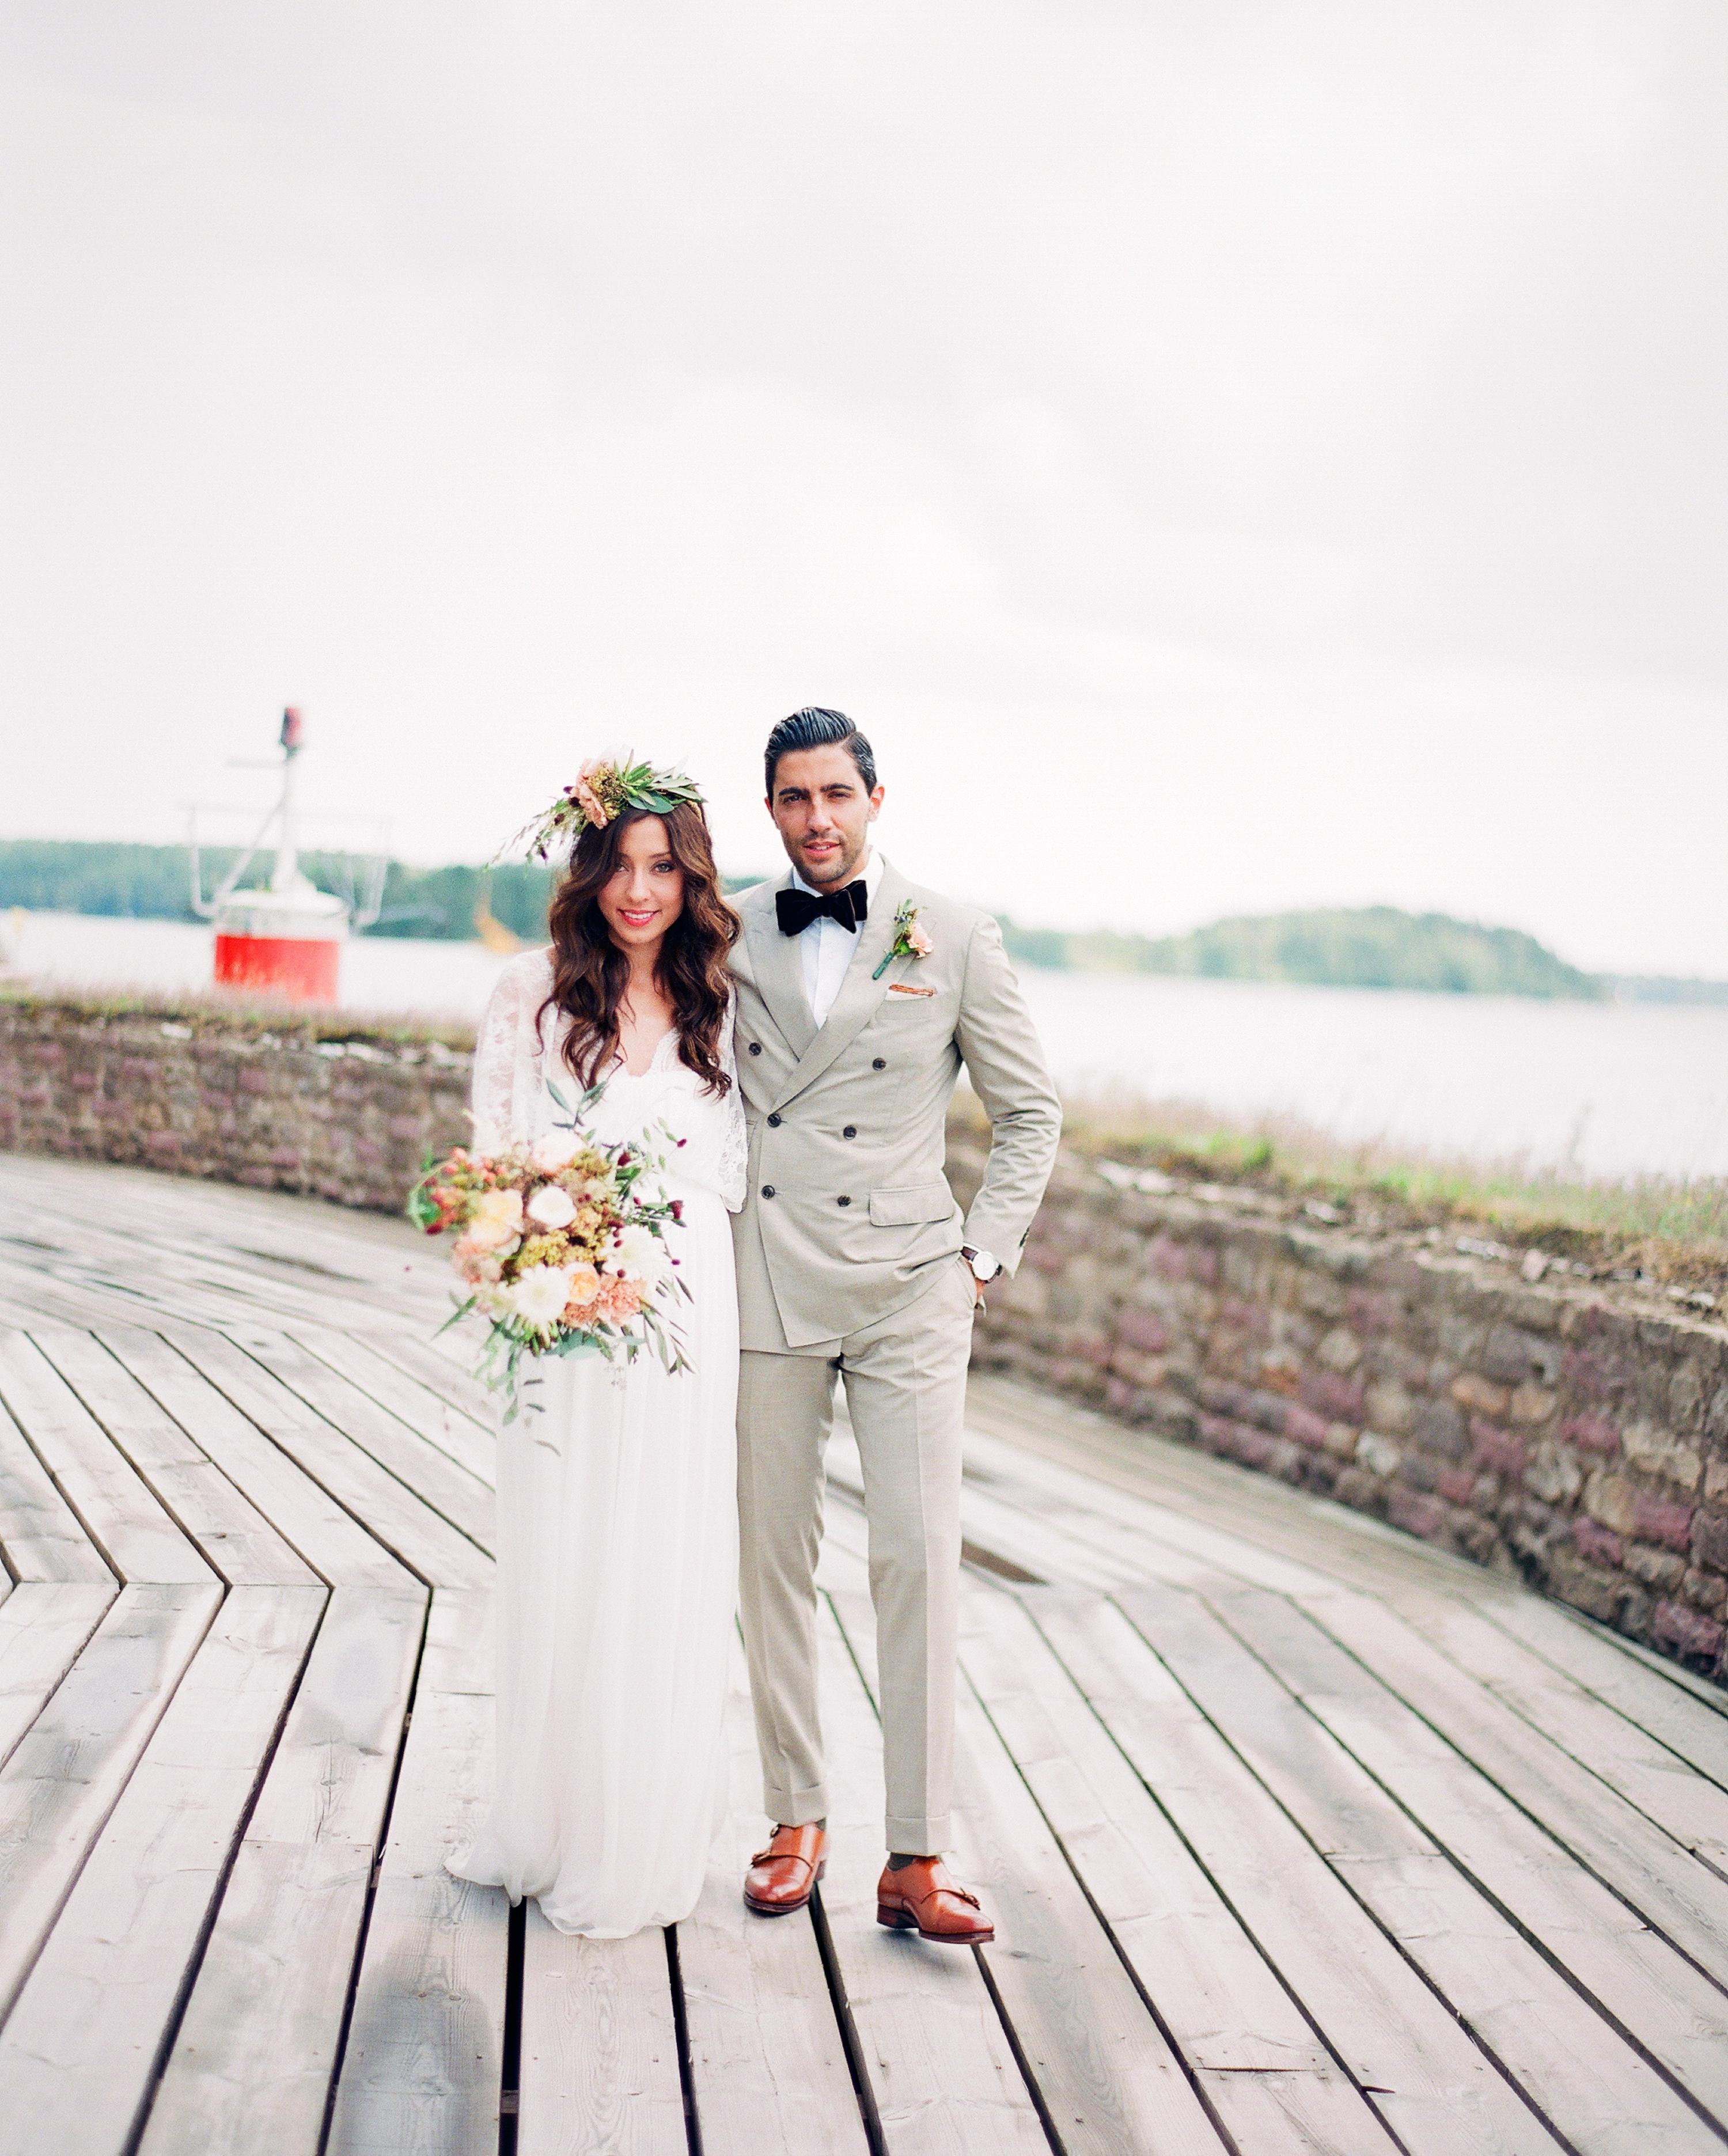 negin-chris-wedding-couple-0113-s112116-0815.jpg